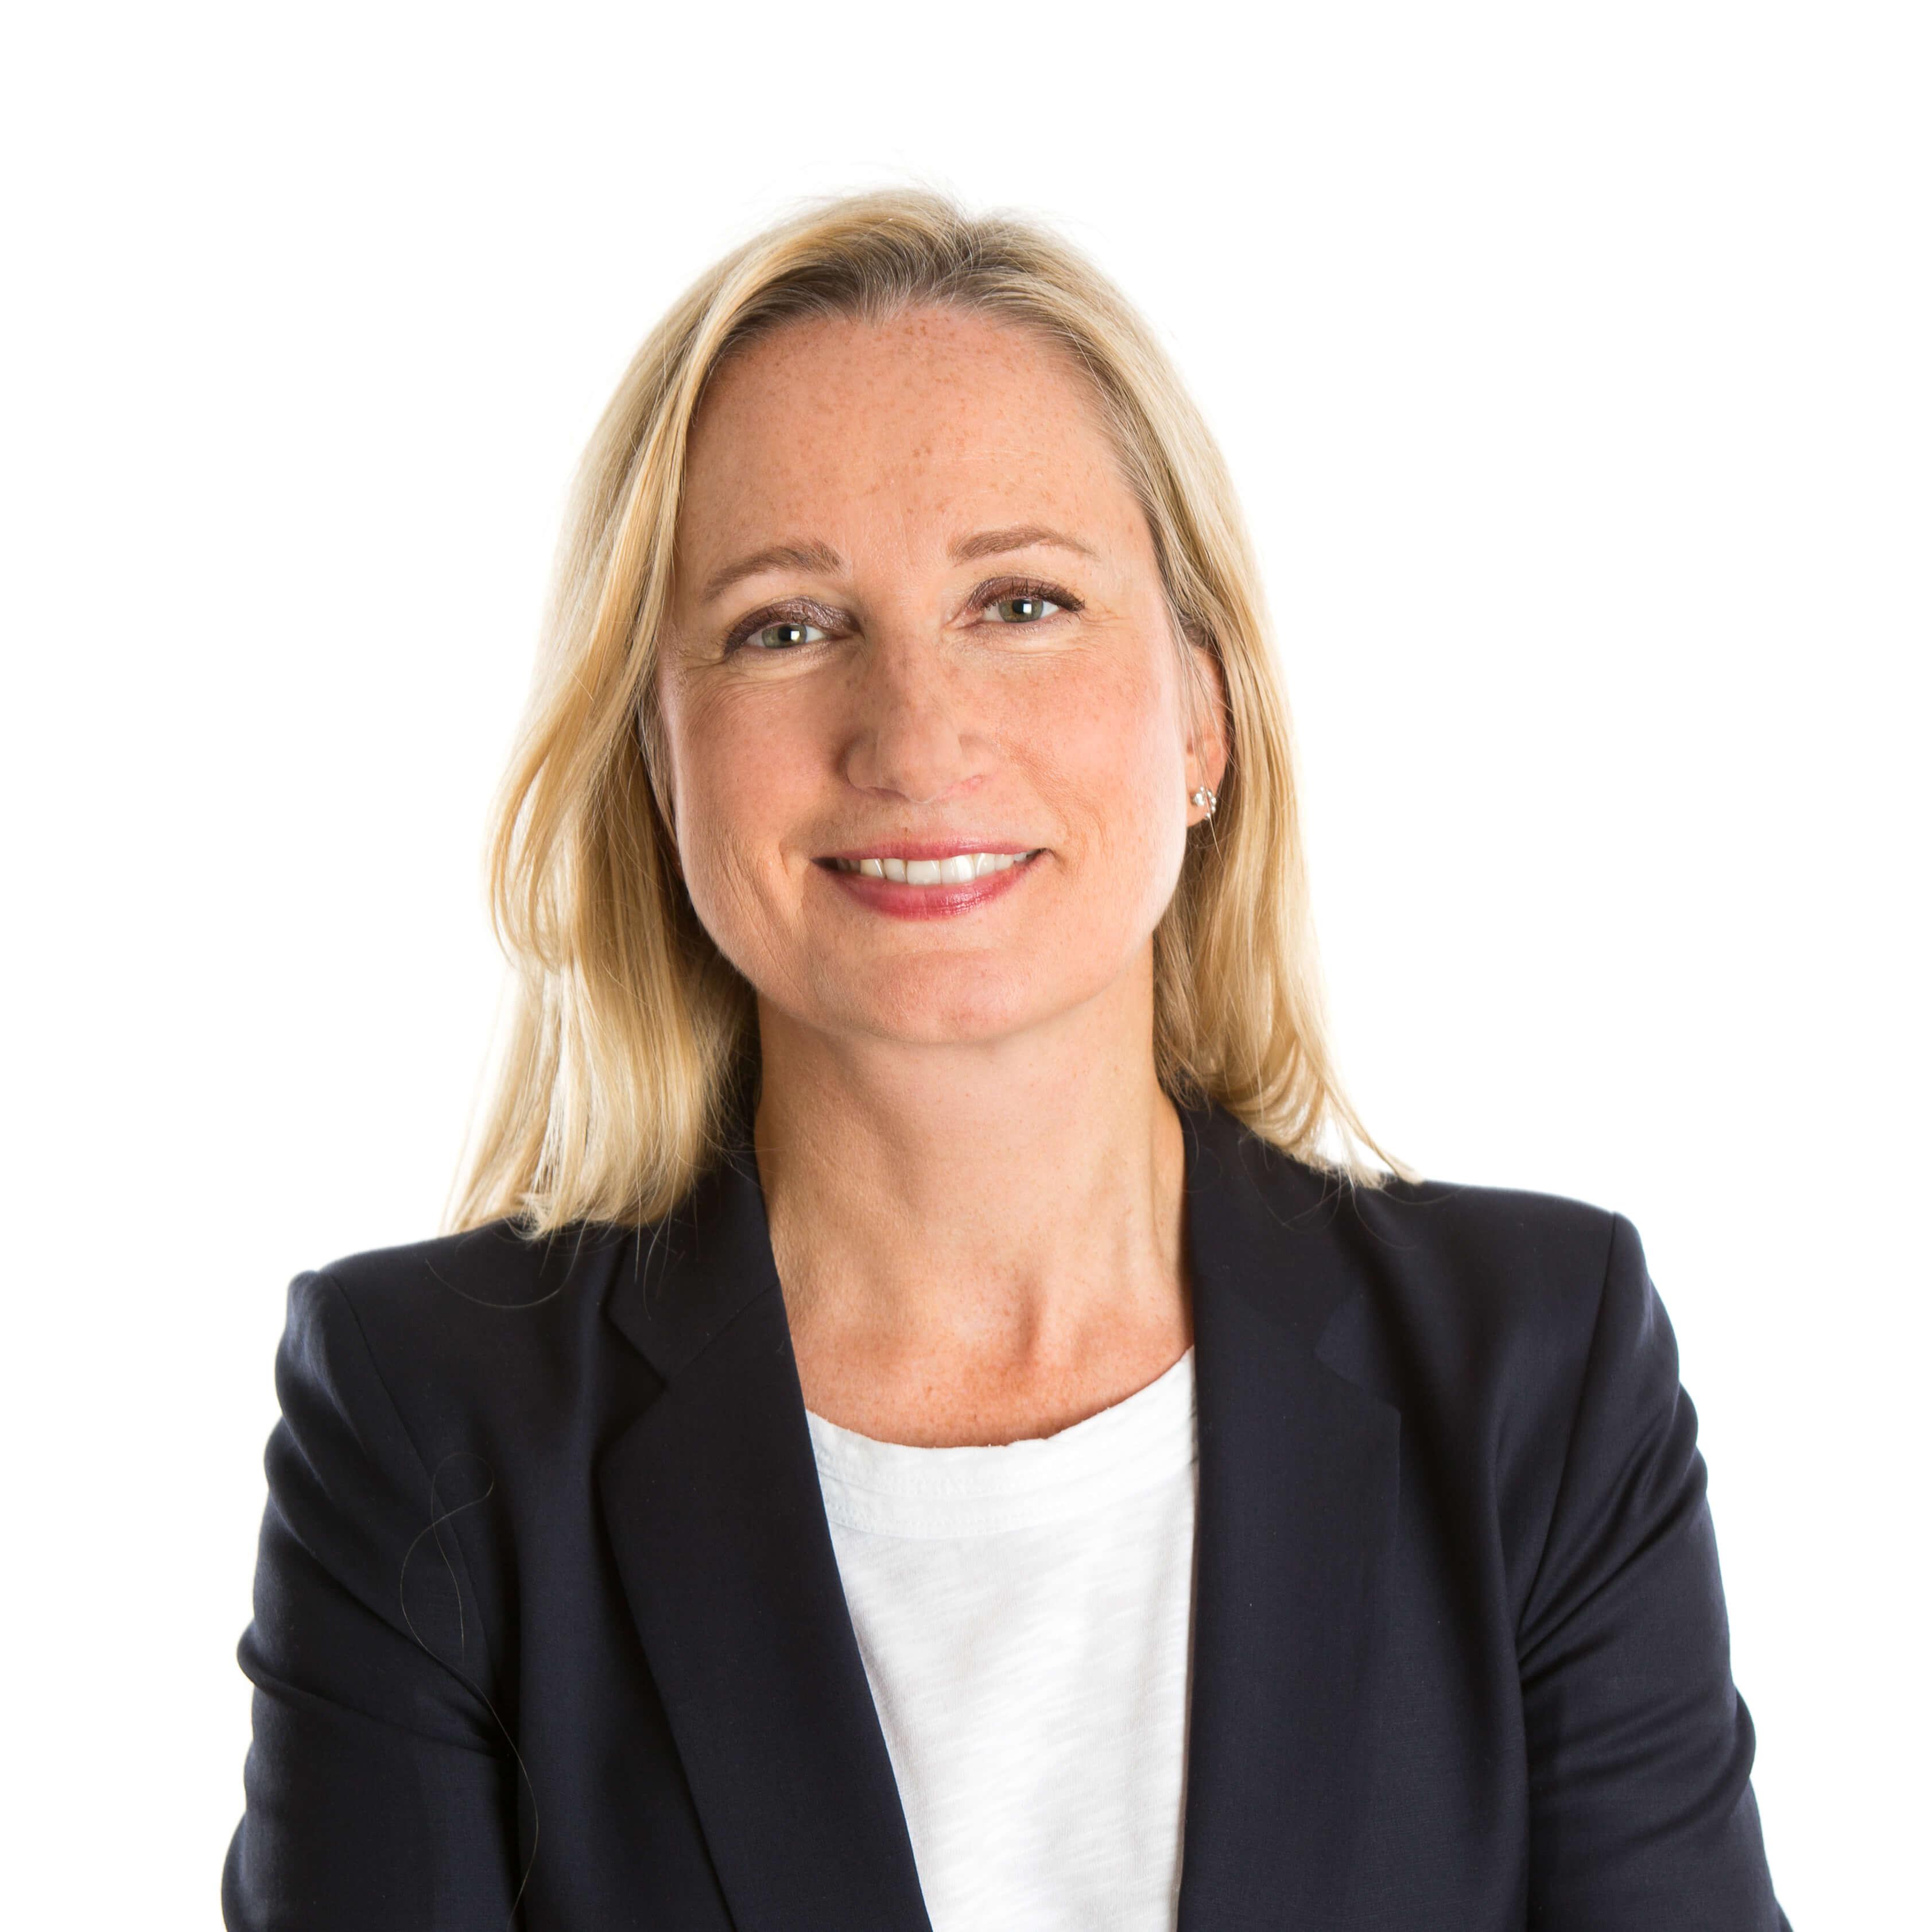 Nina Scales Vice President, International Sales Distribution - AllSpark Hasbro